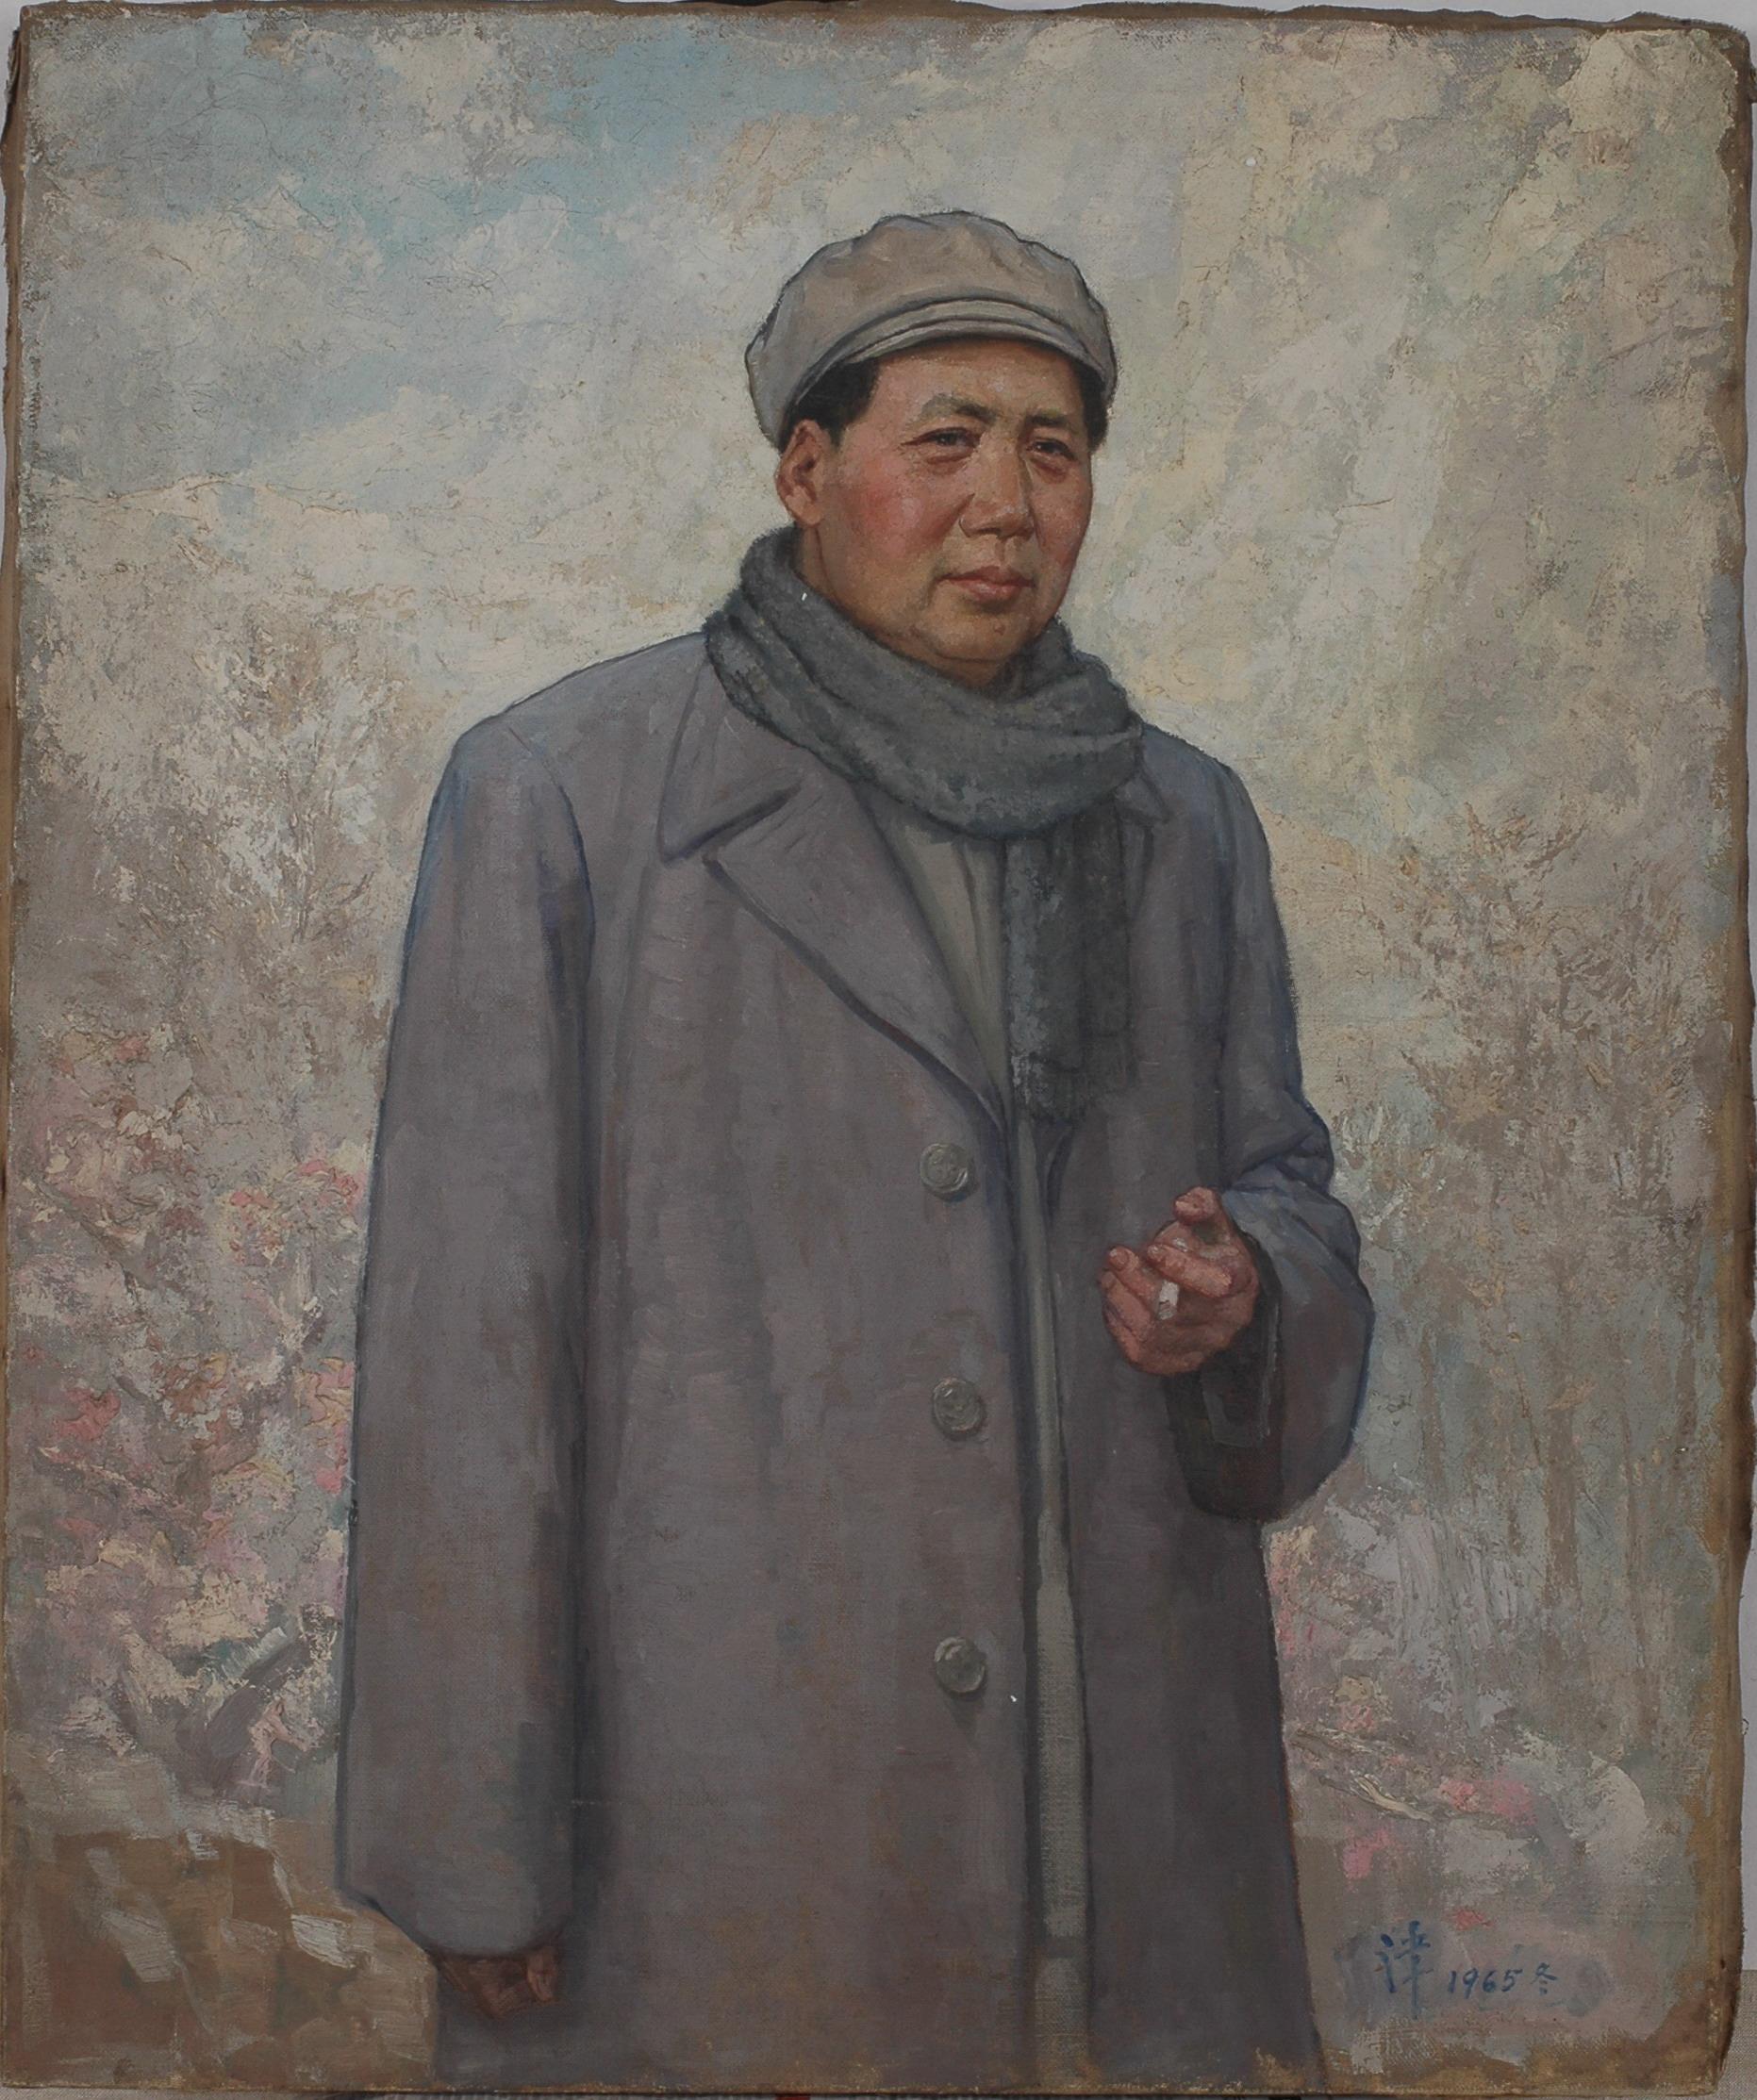 毛泽东像 72.3cm×60cm 油画  1965